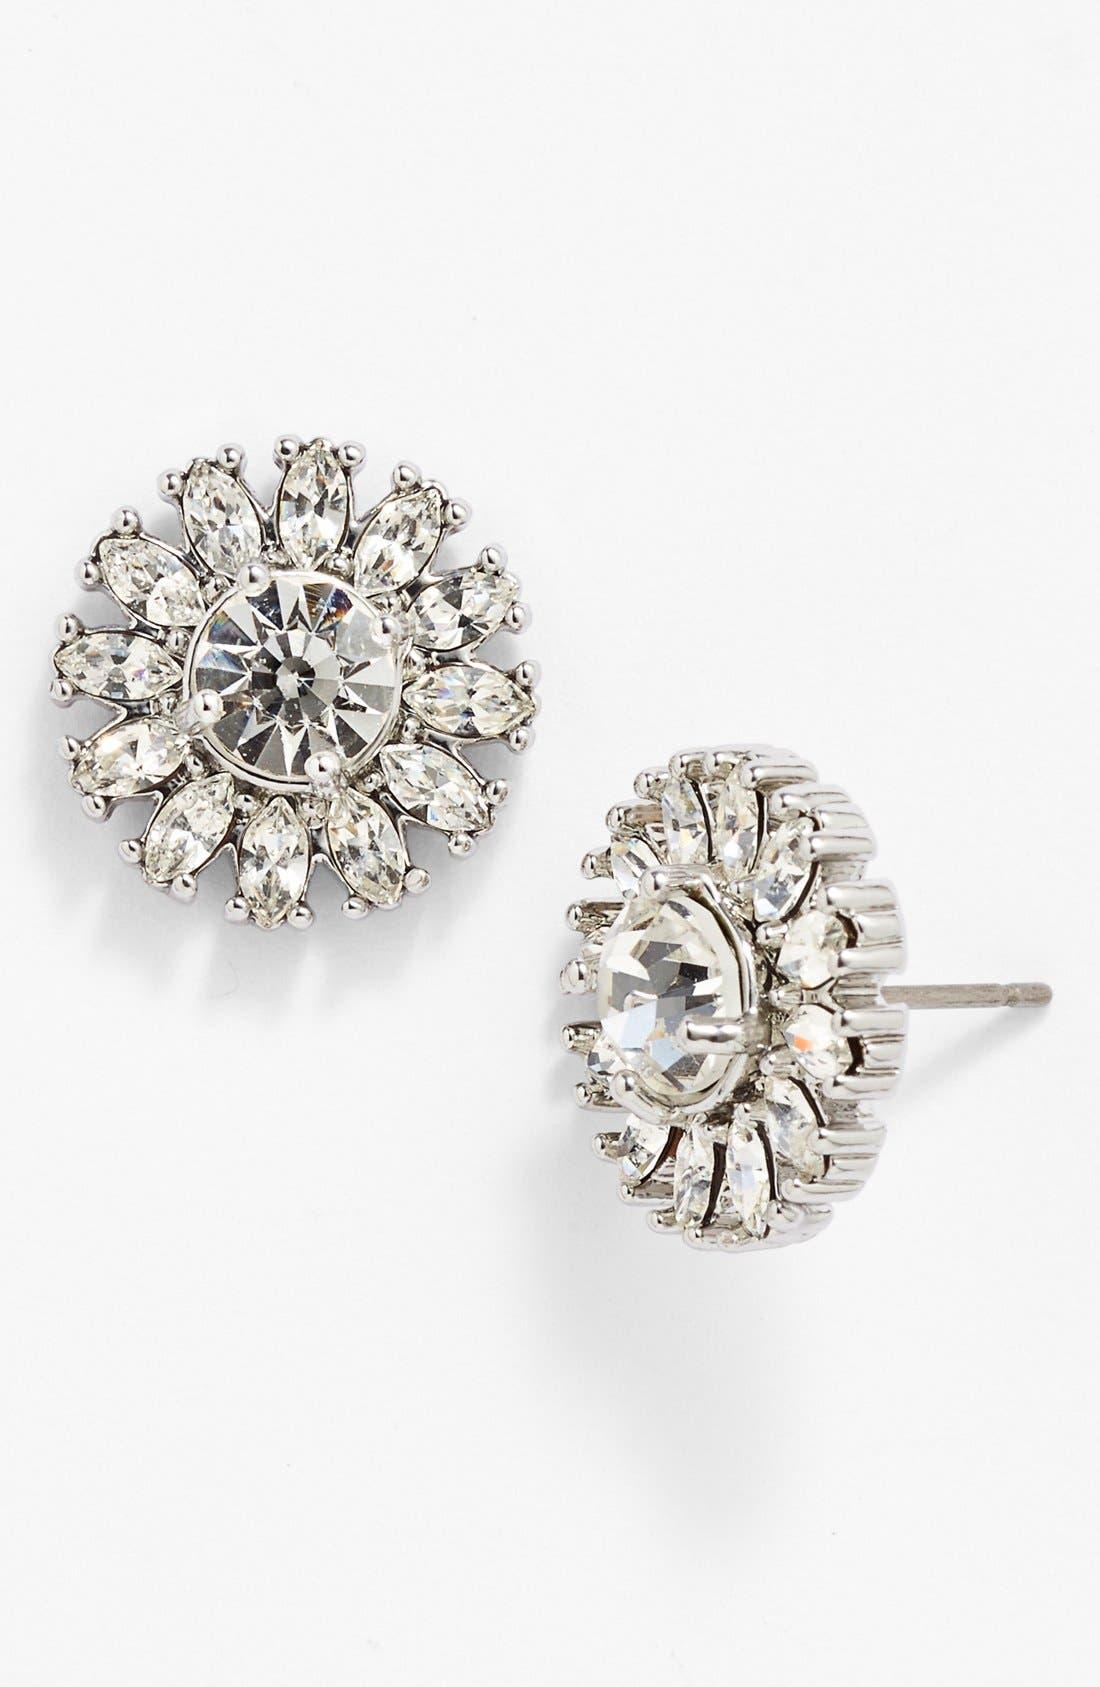 Main Image - kate spade new york 'estate garden' crystal stud earrings